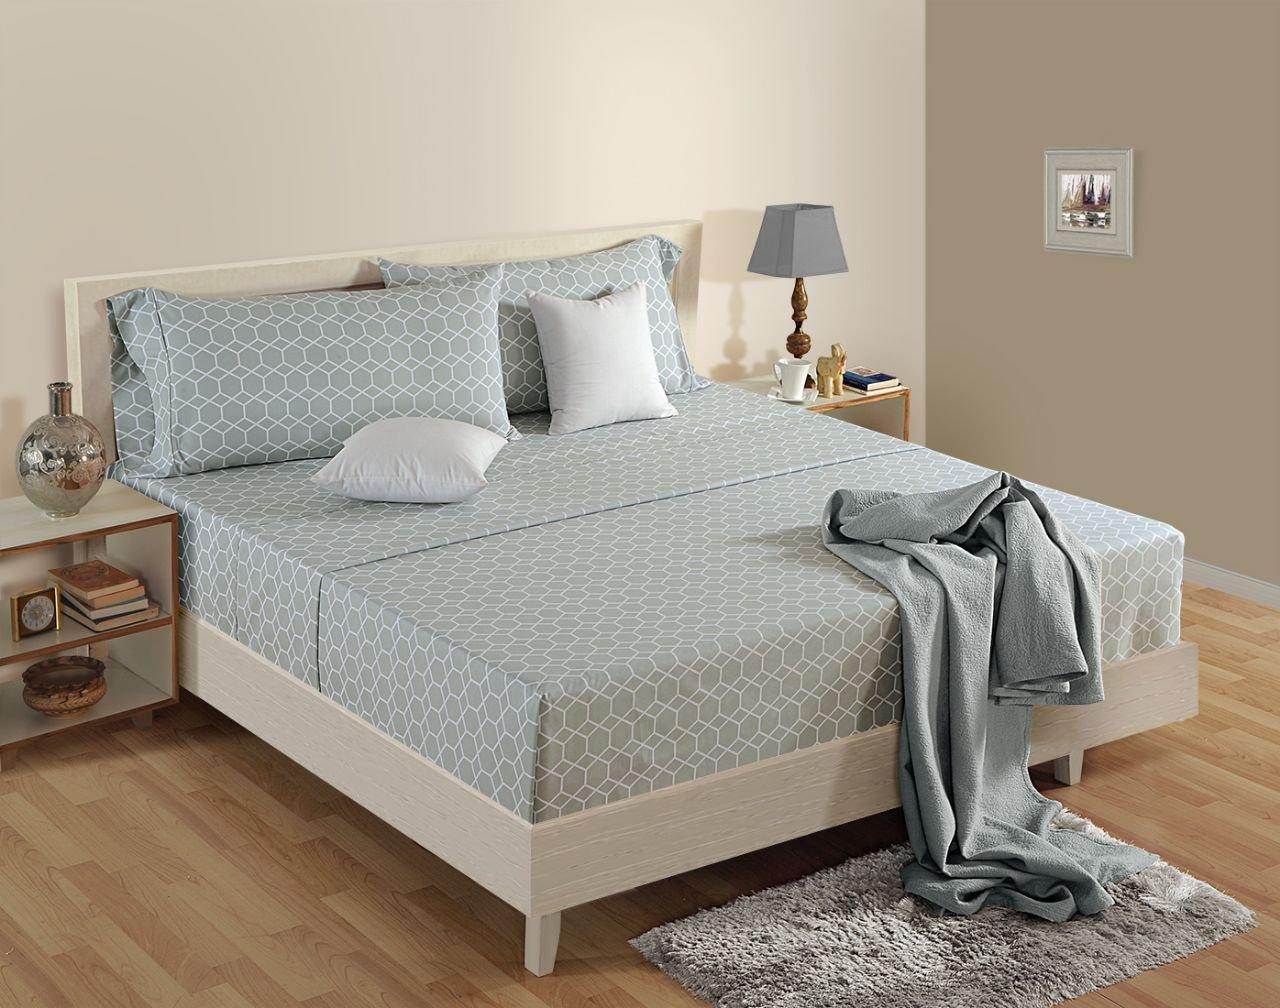 Black Friday Deals - Organic Cotton Full Size Sheet Set Silver Frette Pattern